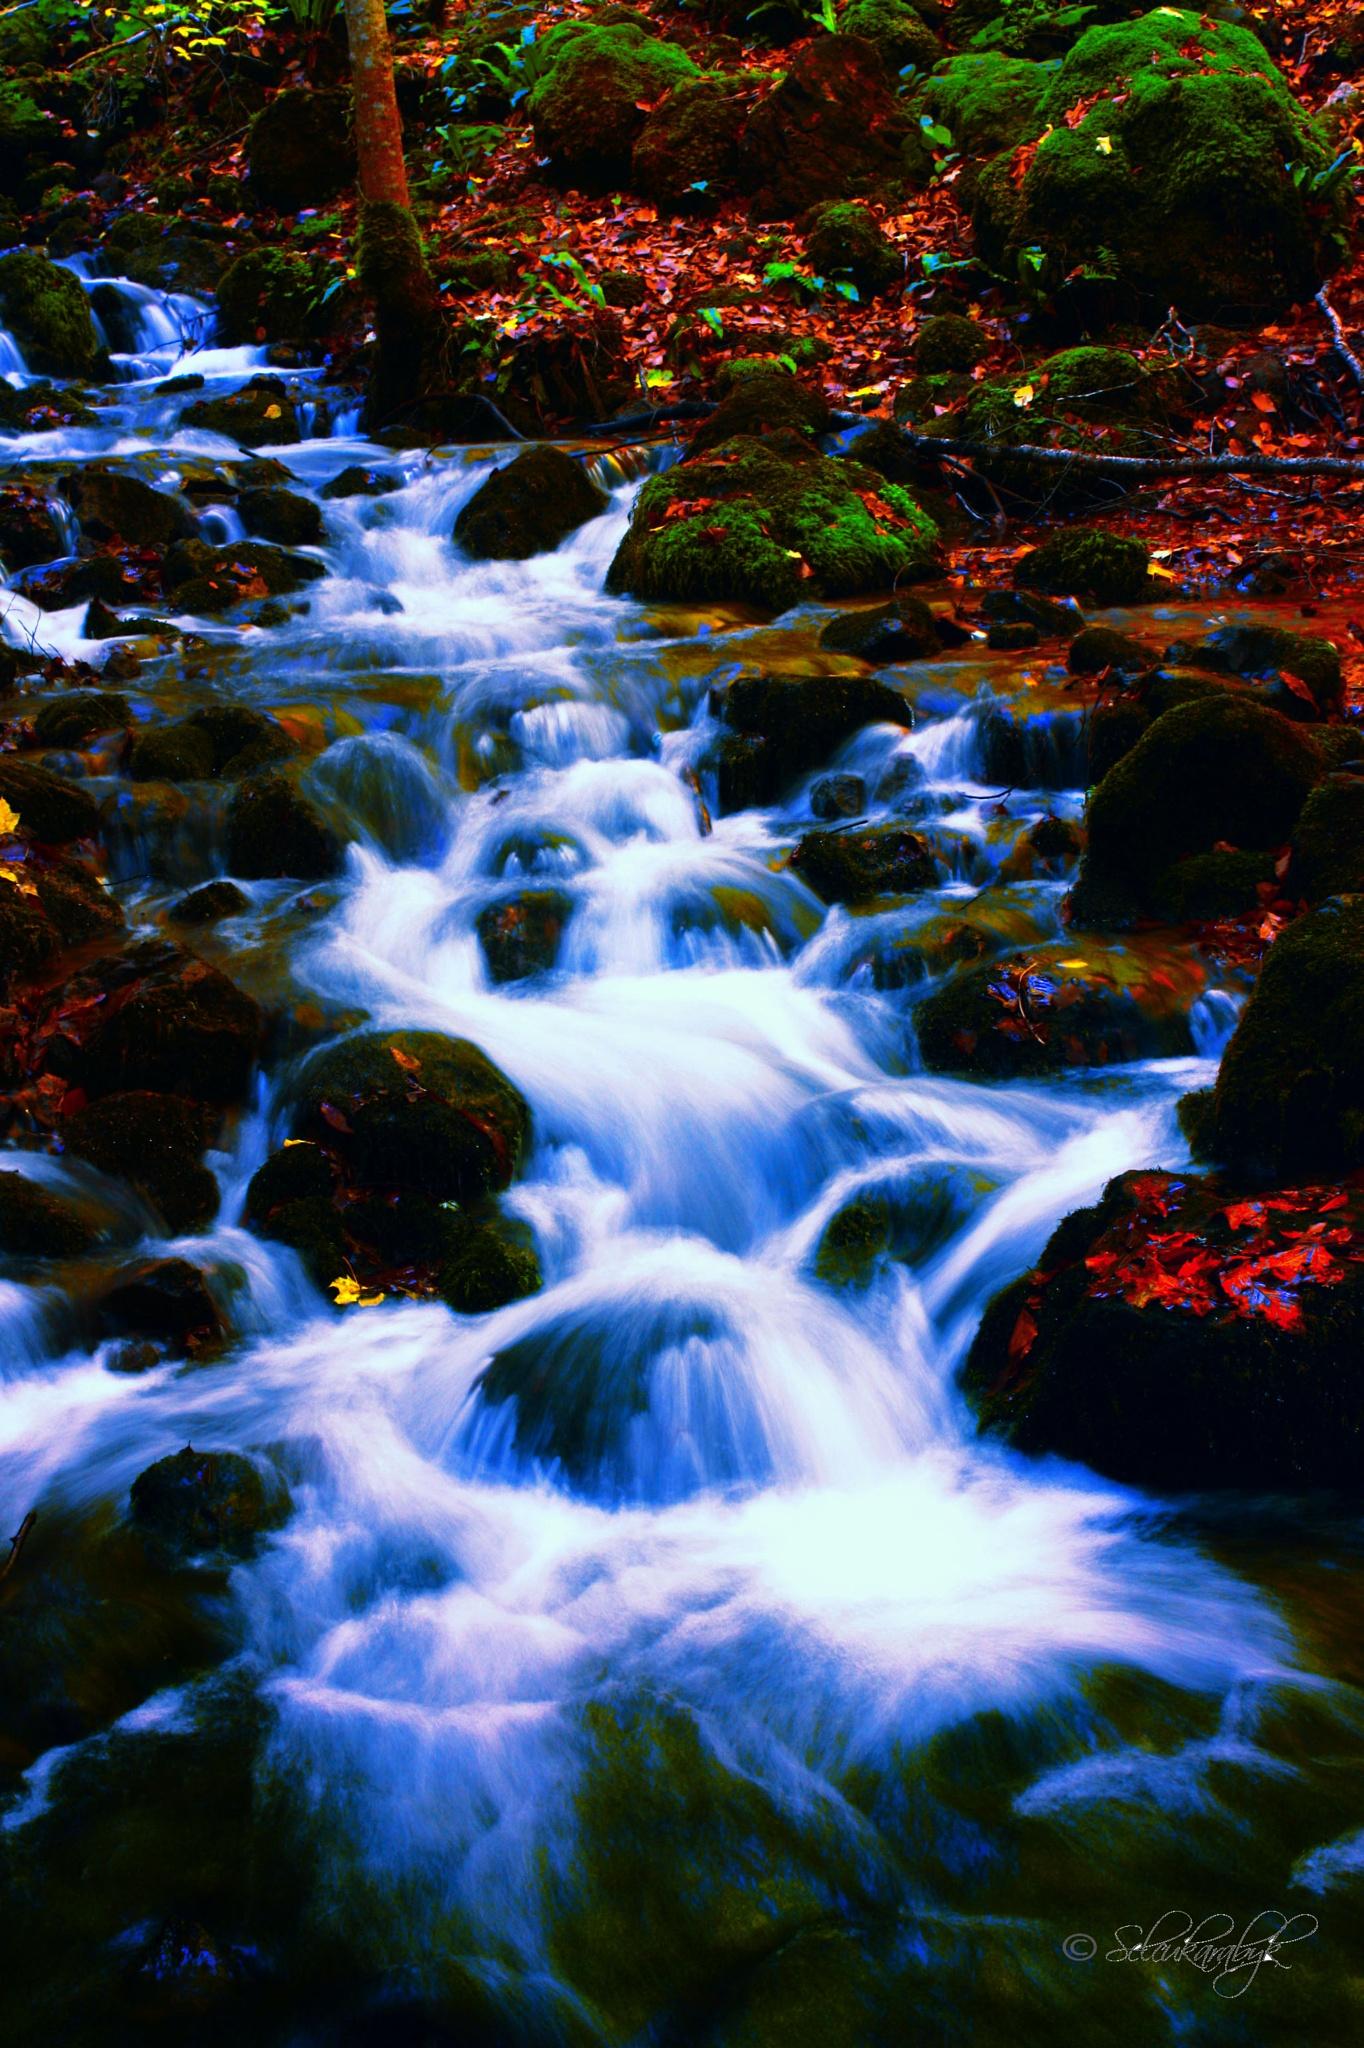 Bolu Sevenlakes River by fotobjektif